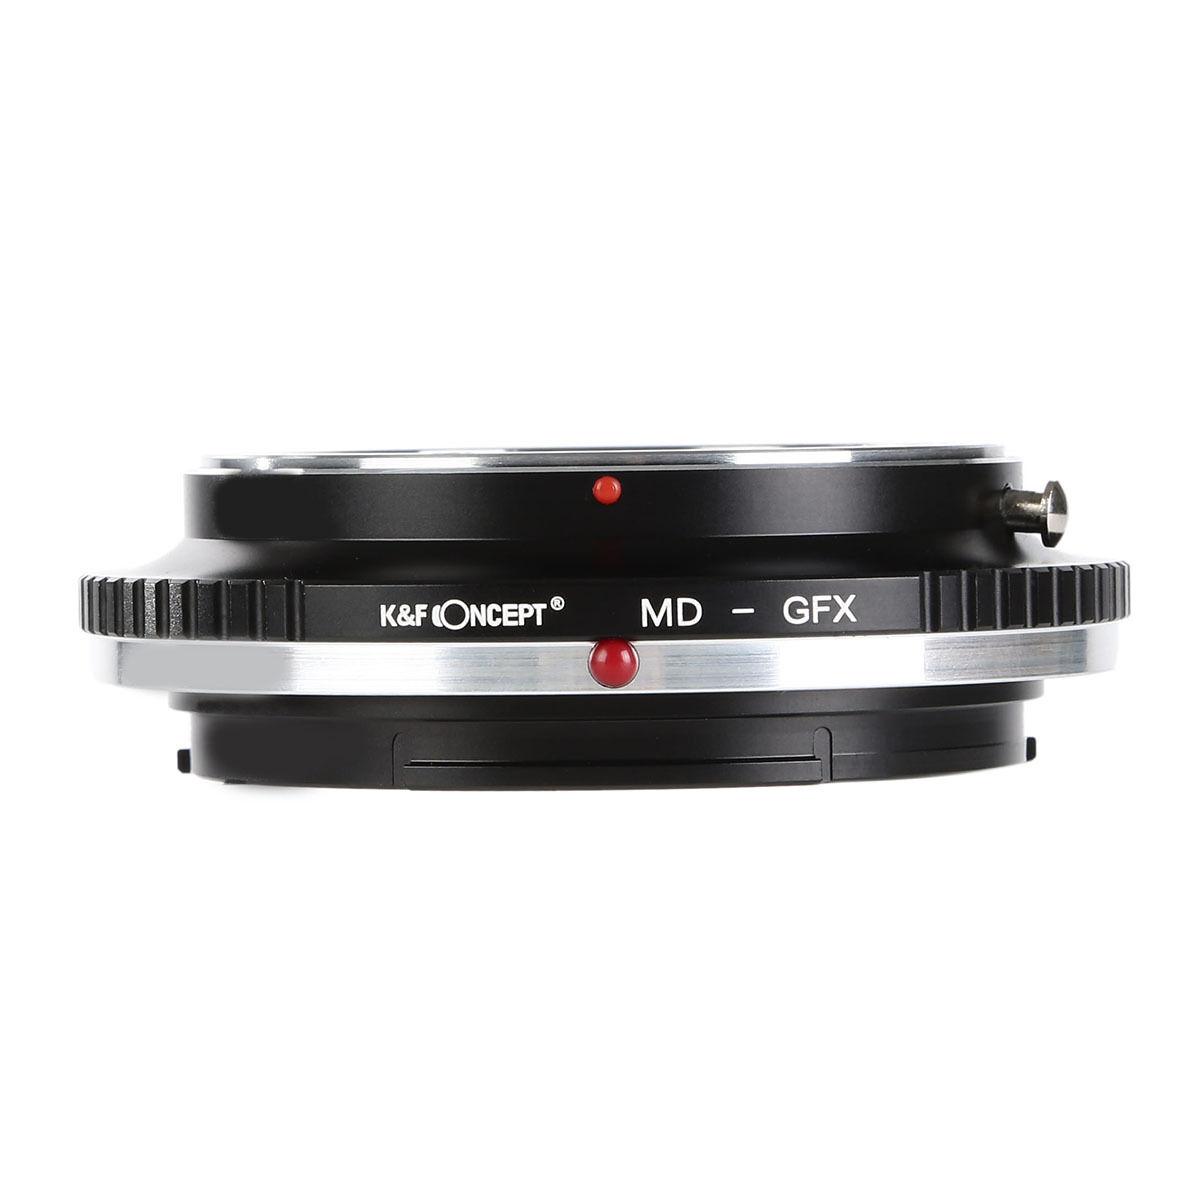 Kf Concept Adapter For Minolta Md Mount Lens To Fuji Gfx Medium Kipon Mamiya 645 Format Camera